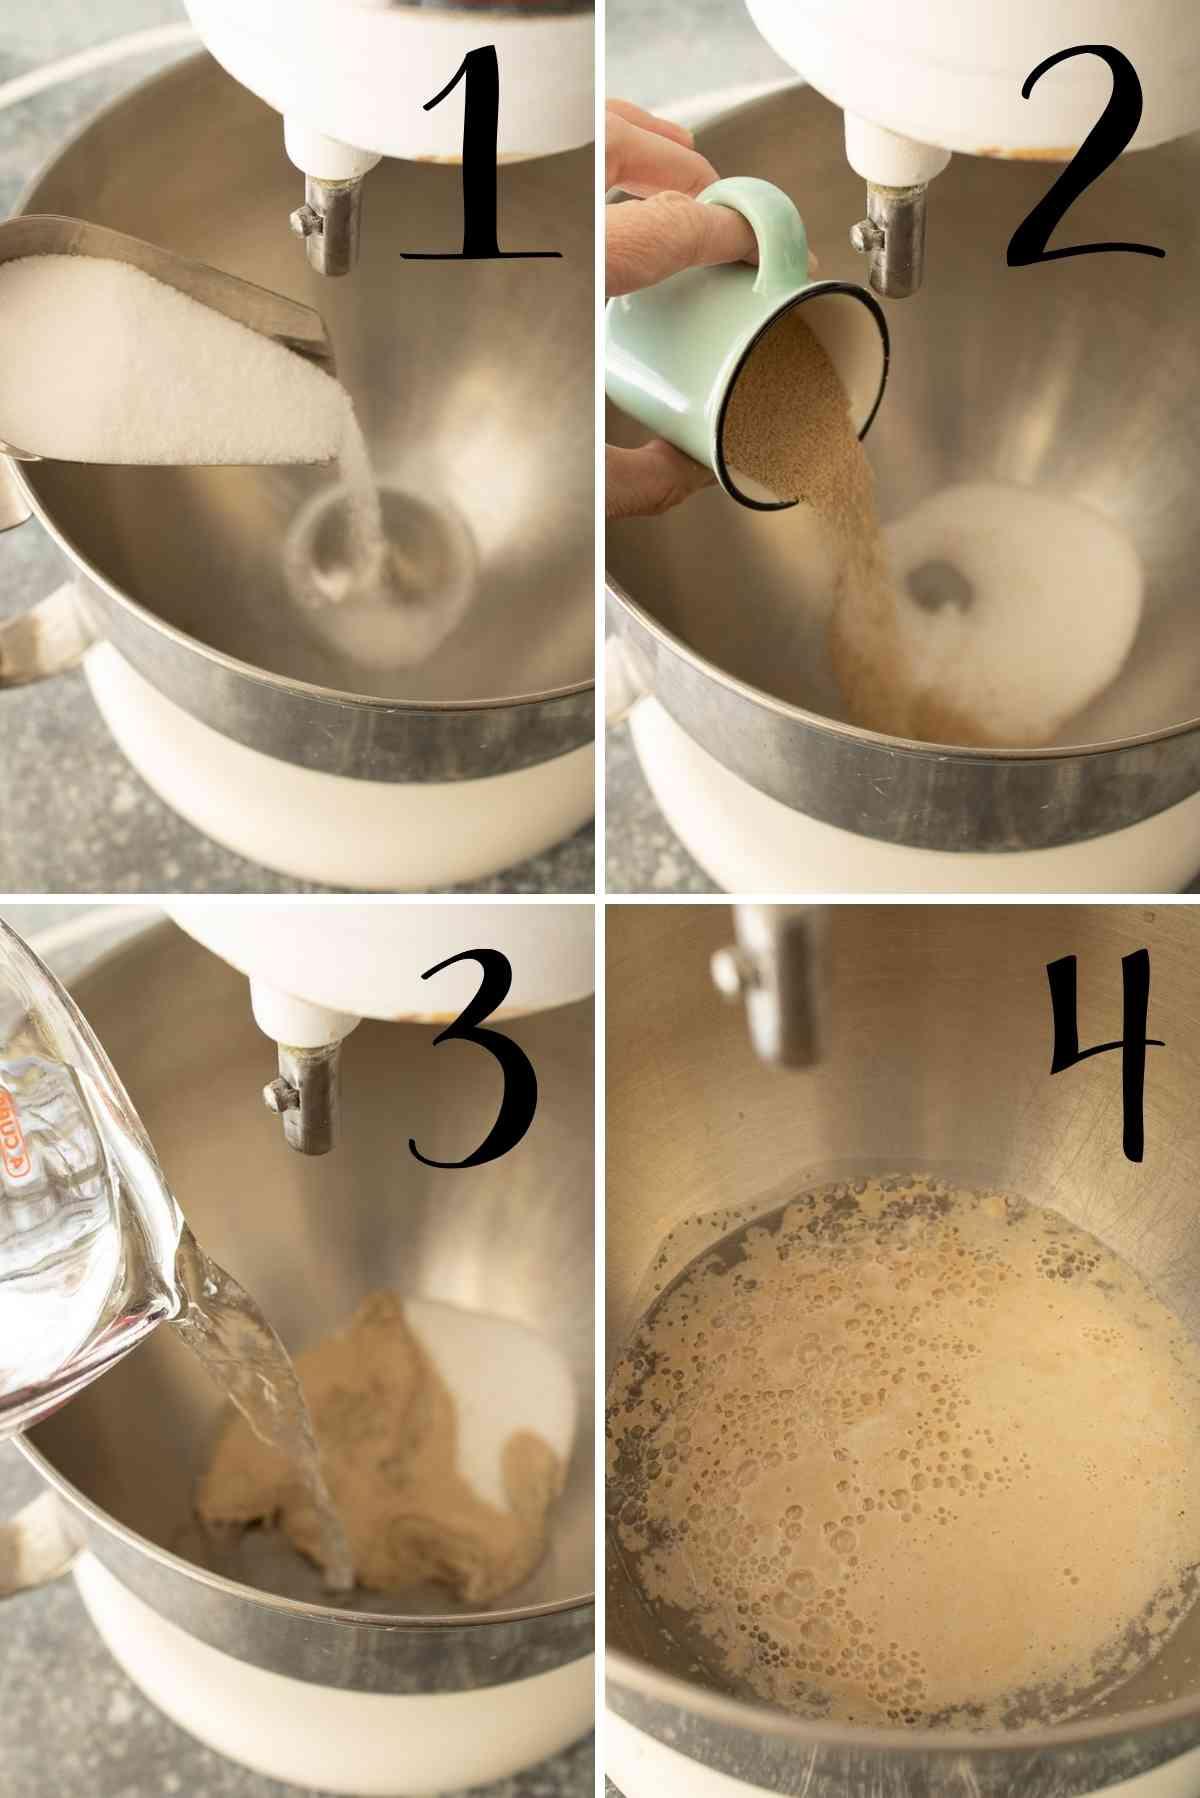 Sugar, yeast and warm water getting foamy.